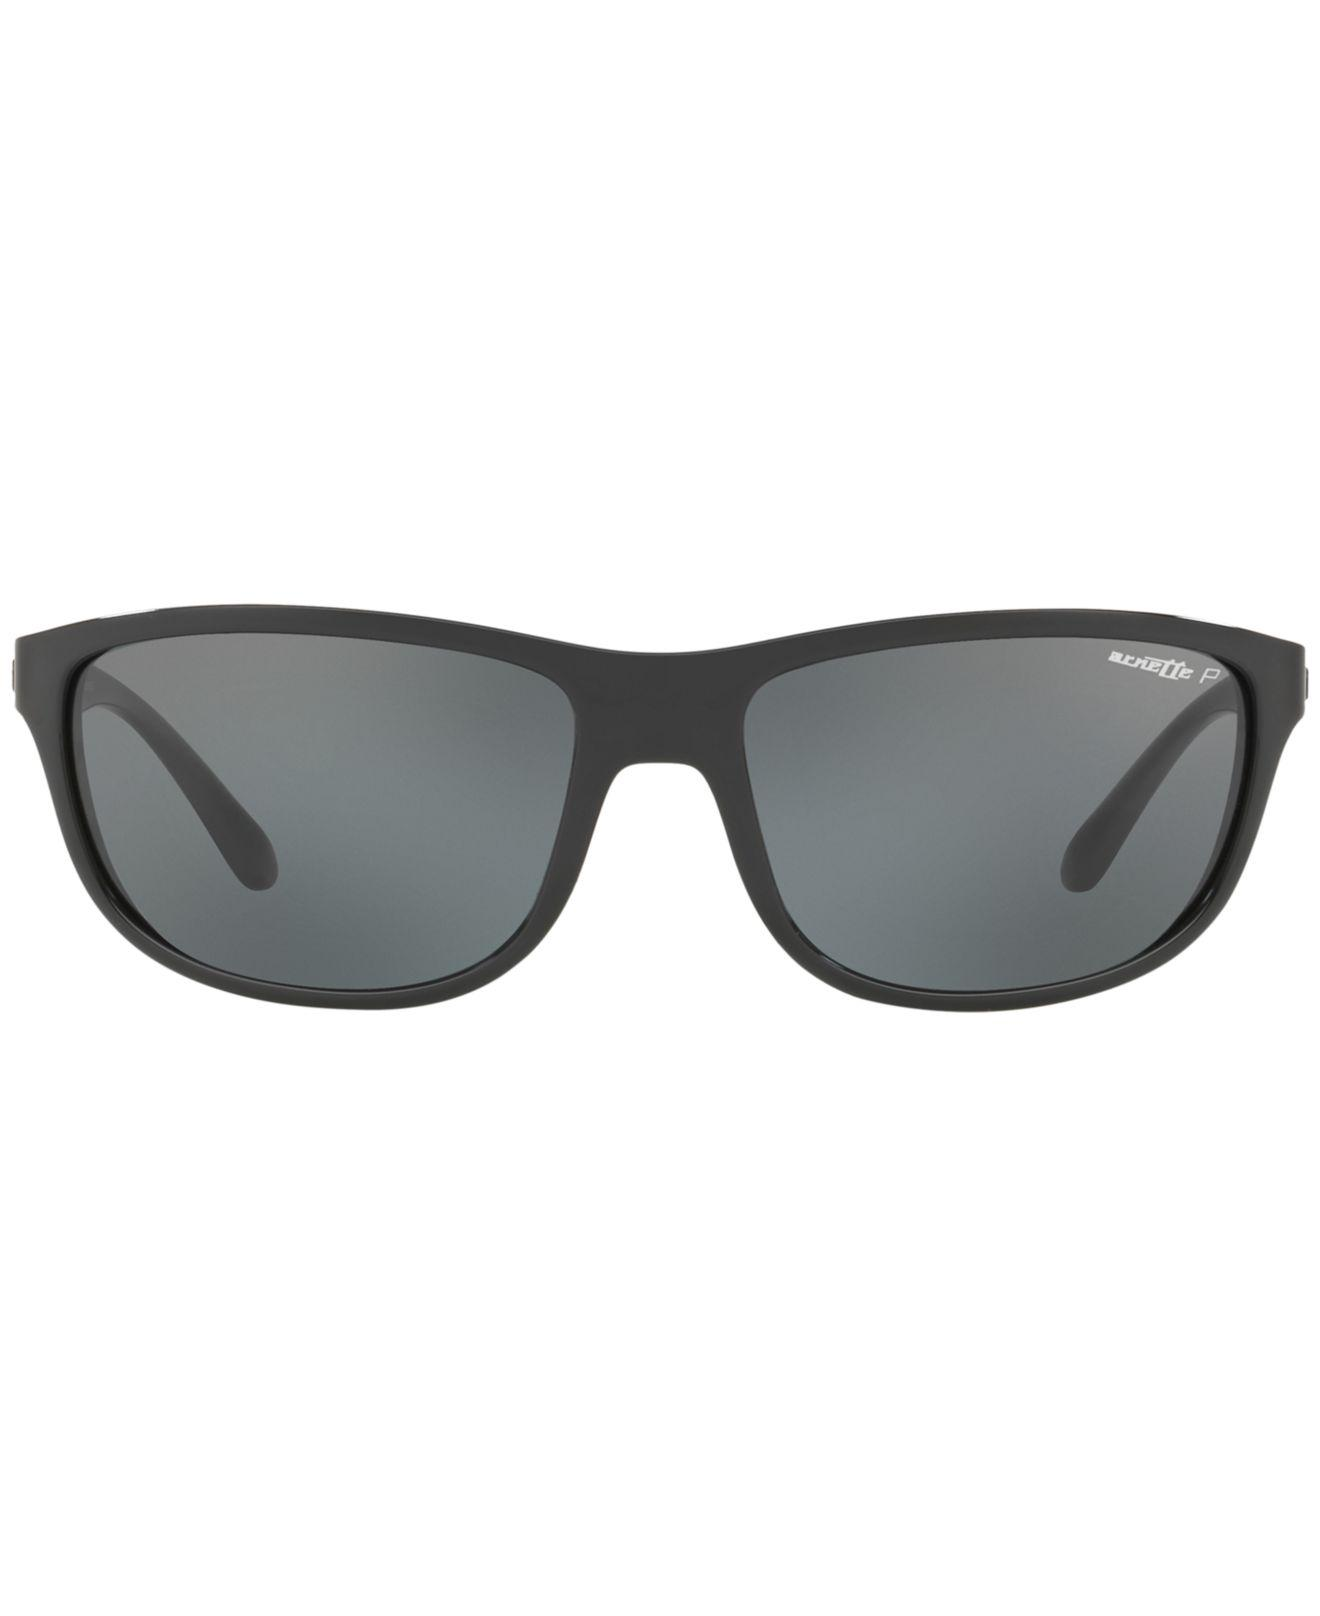 b565feeacb8 Lyst - Arnette Polarized Sunglasses